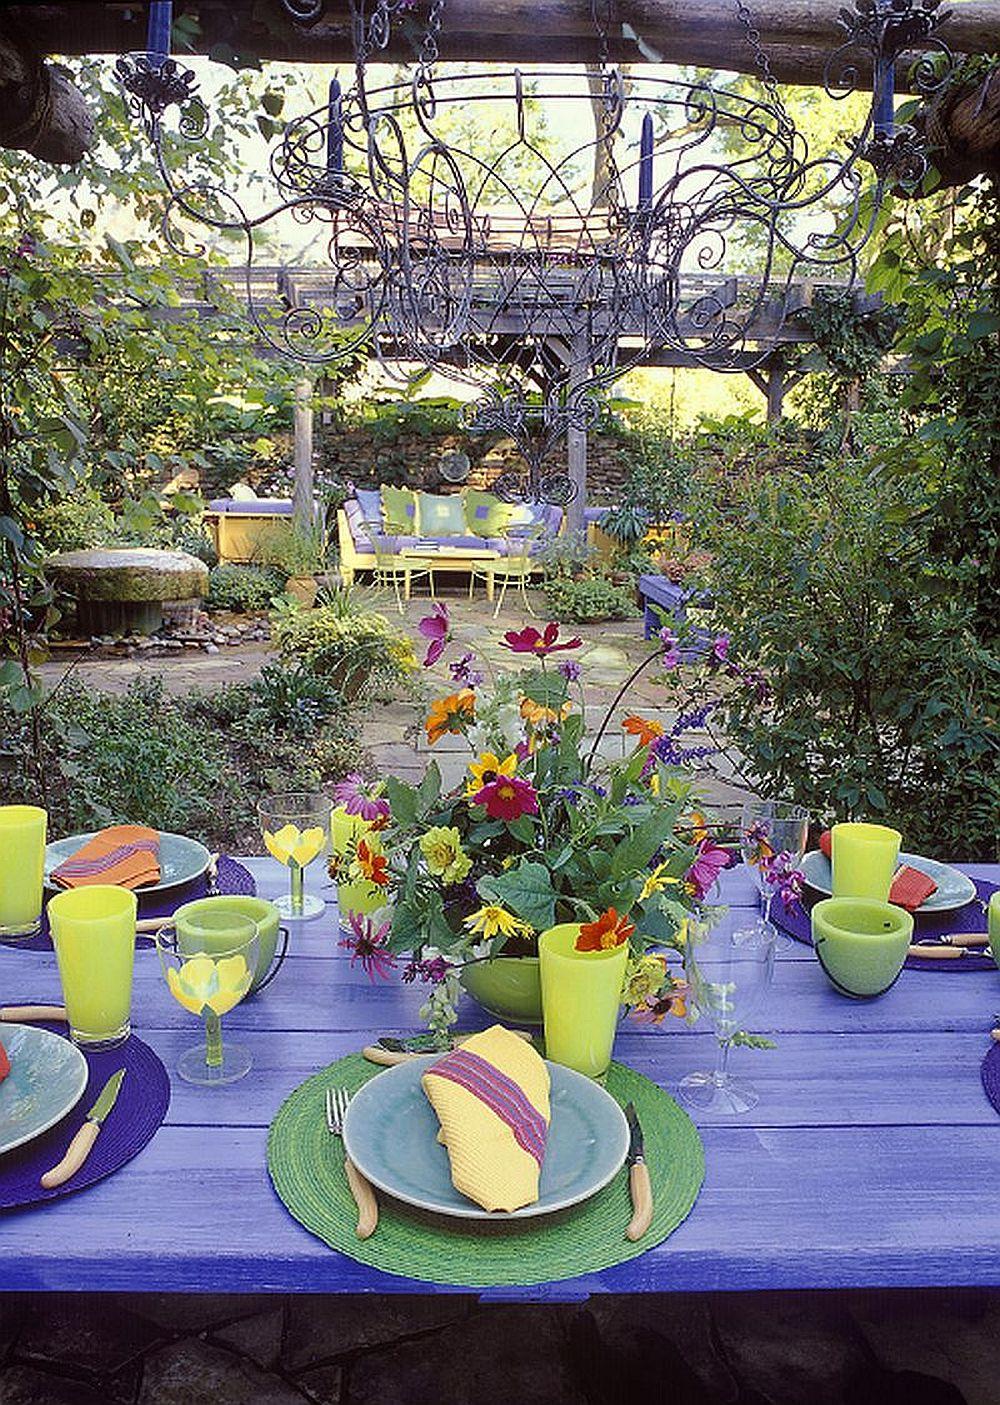 adelaparvu.com despre gradina rustica, Orchard Farm, design Clinton and Associates Landscape Architects, Foto Roger Foley (5)